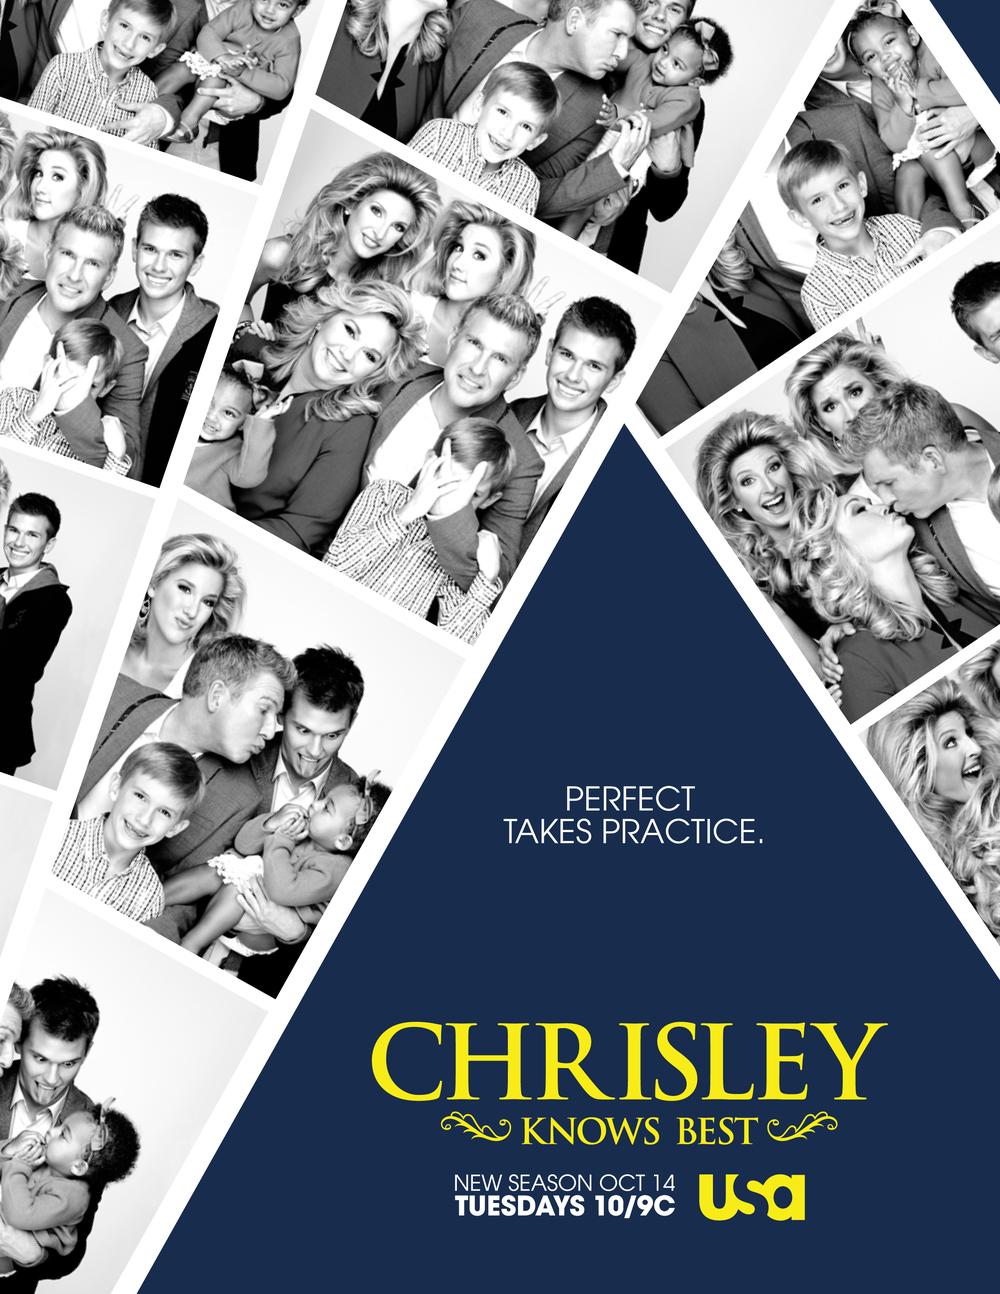 chrisley_photoStrip-1.jpg